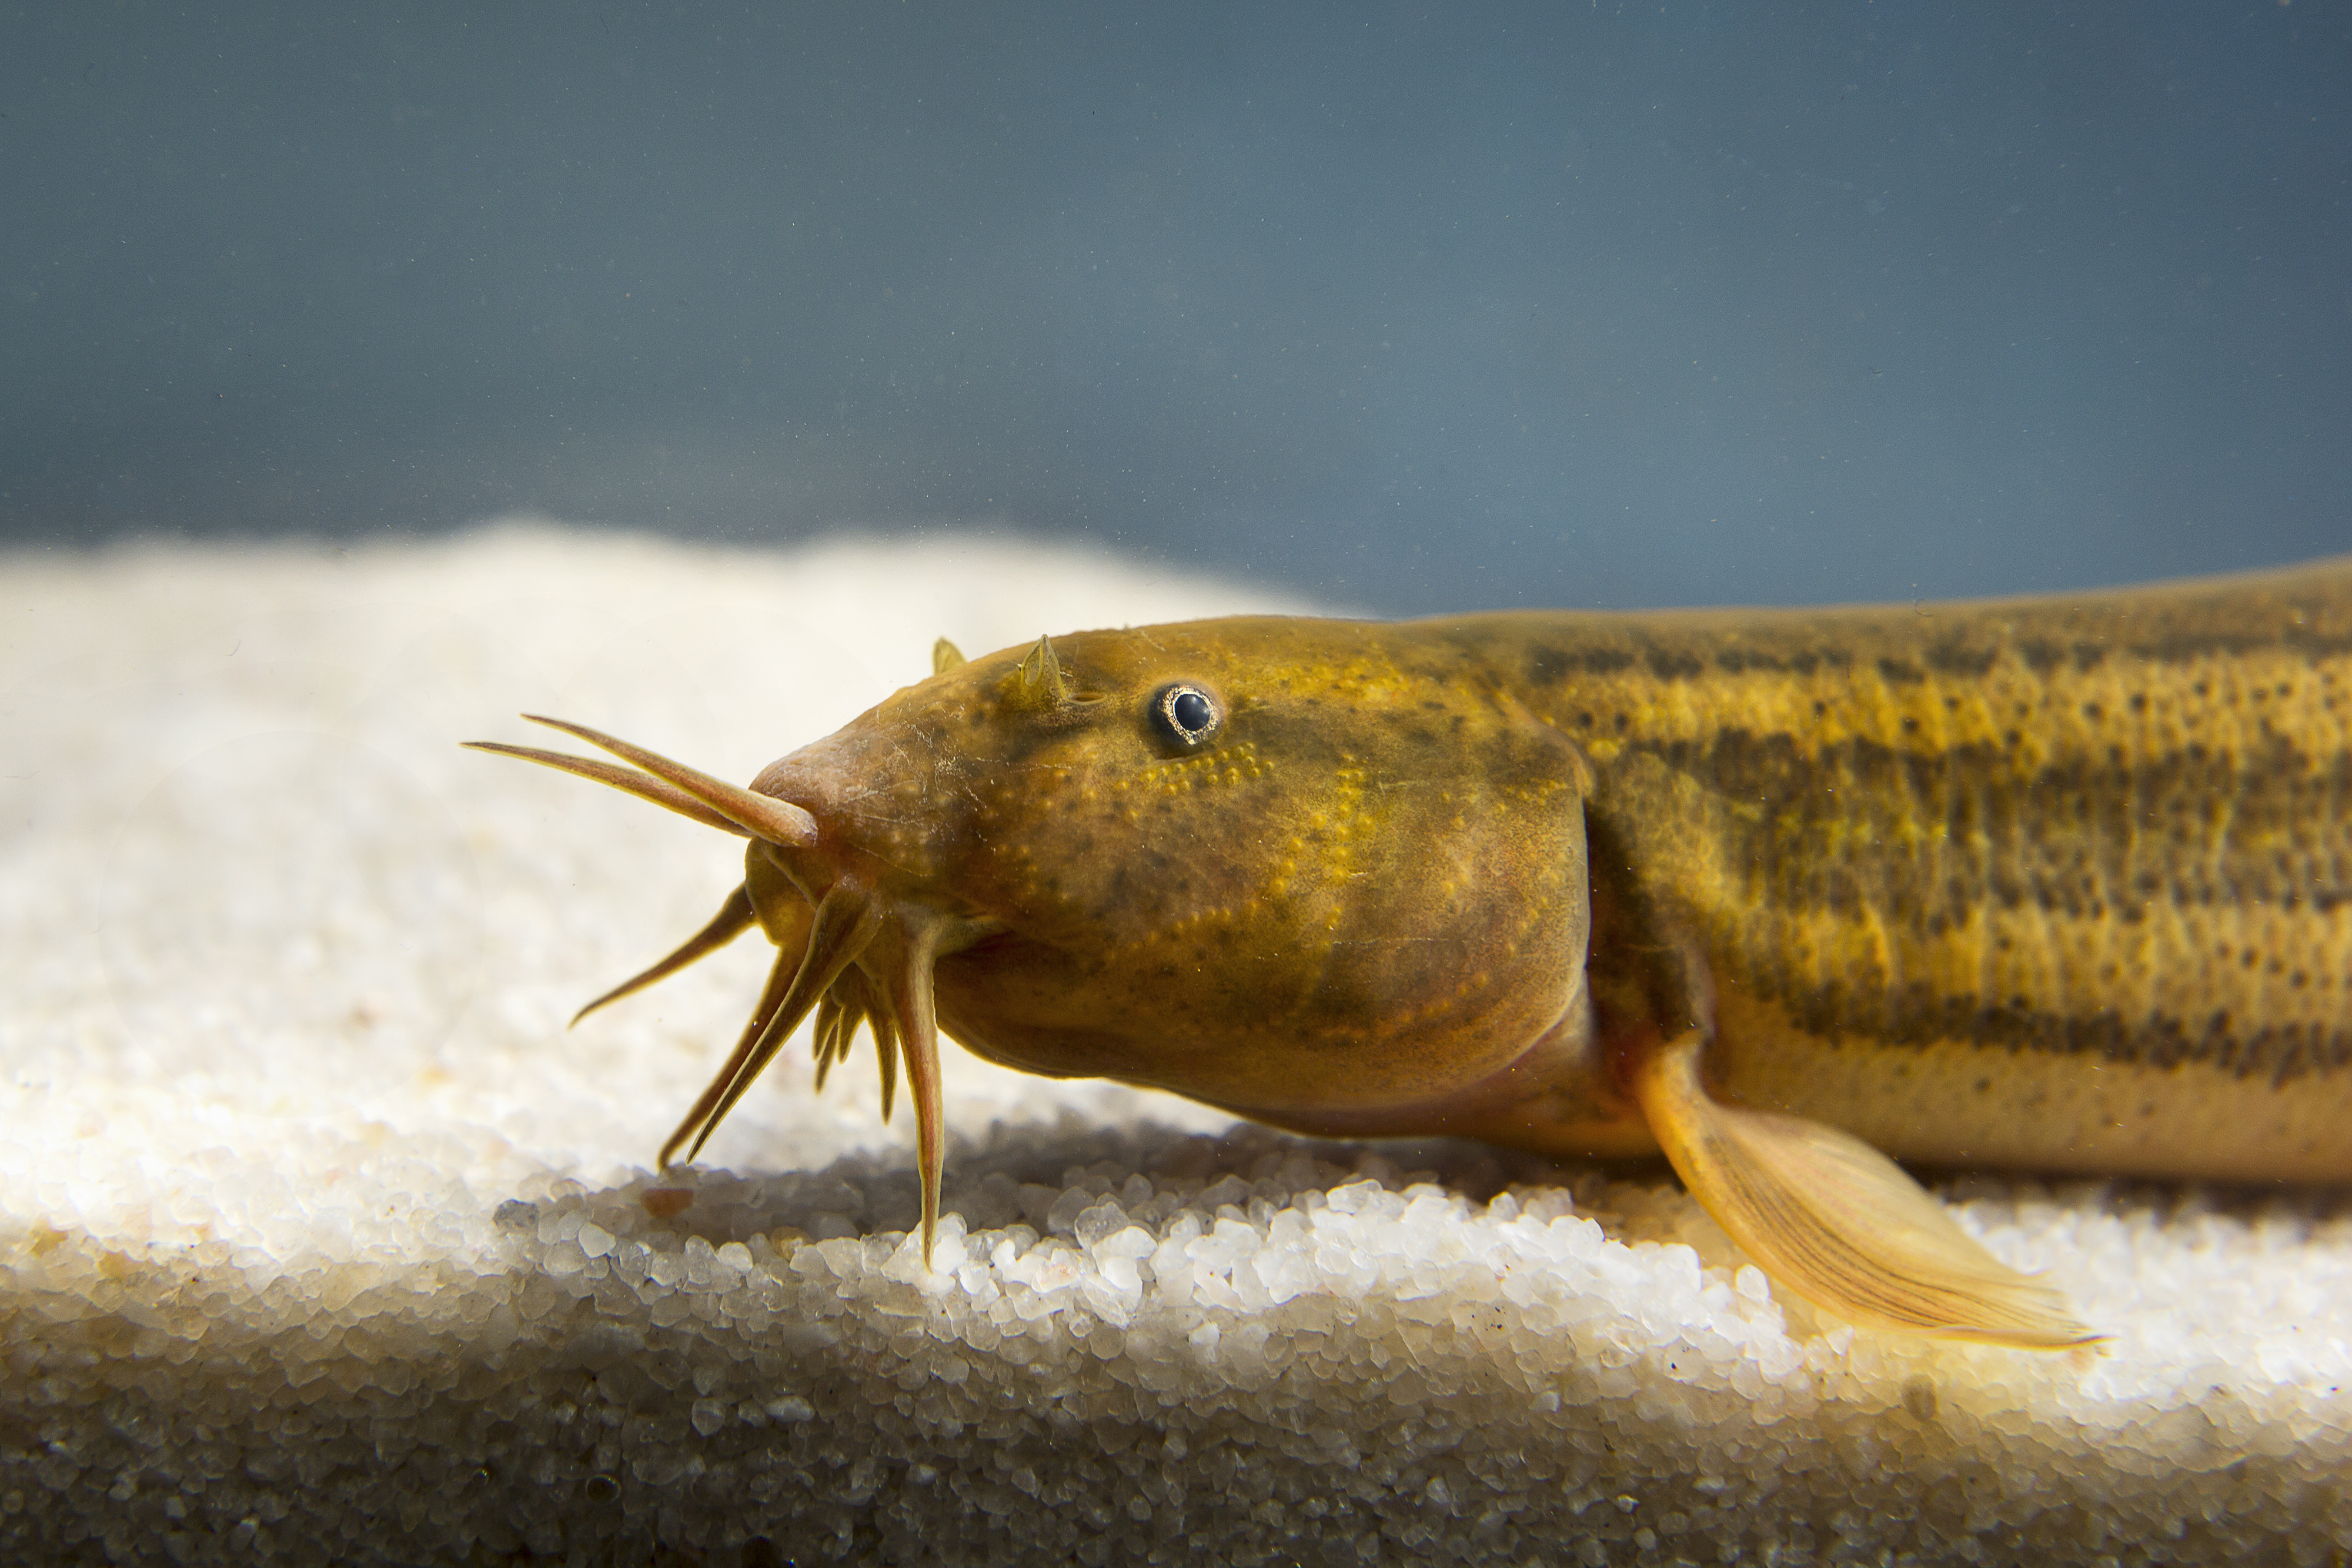 Pond loach aka Weather loach (Misgurnus fossilis)